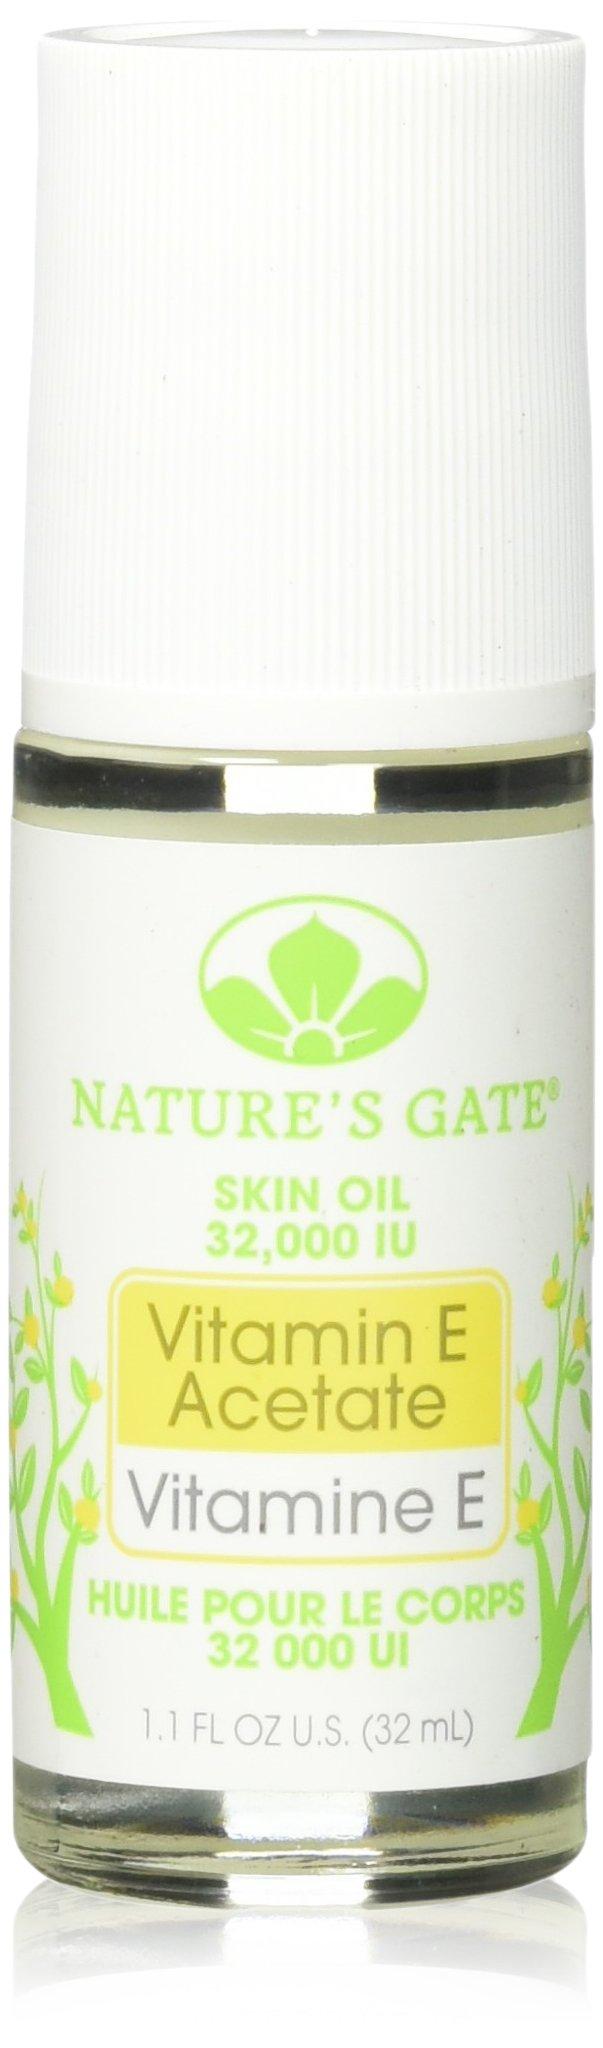 Nature's Gate 32,000 I.U. Roll-on Vitamin E Oil - 1.1 oz